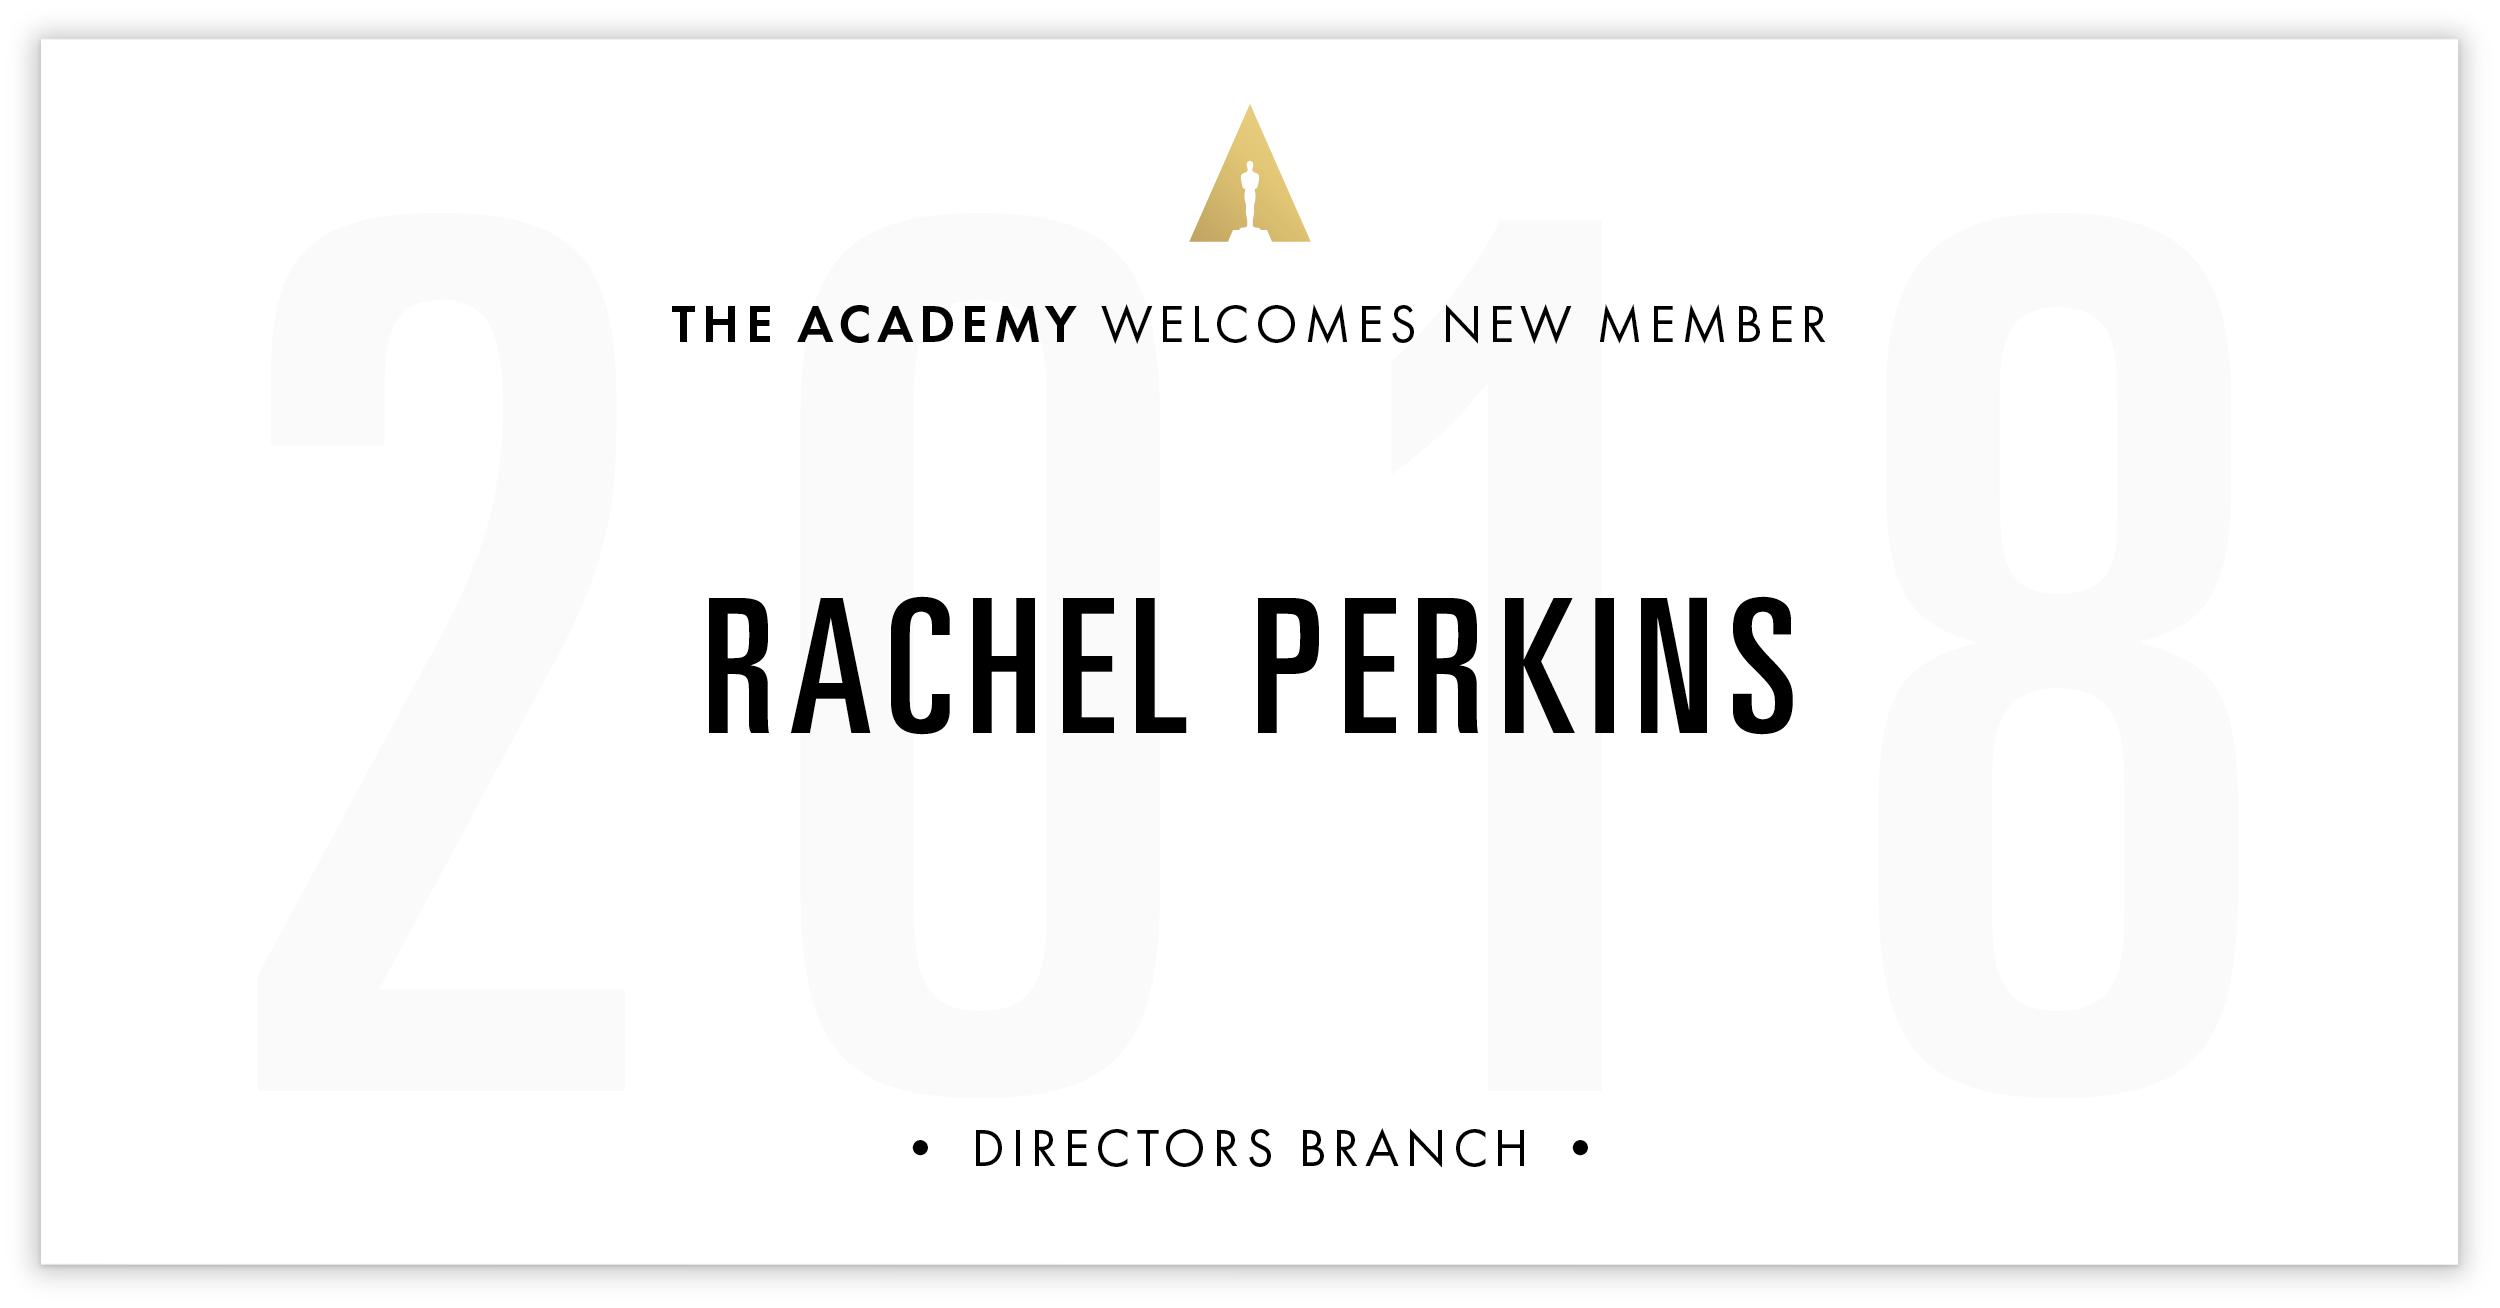 Rachel Perkins is invited!